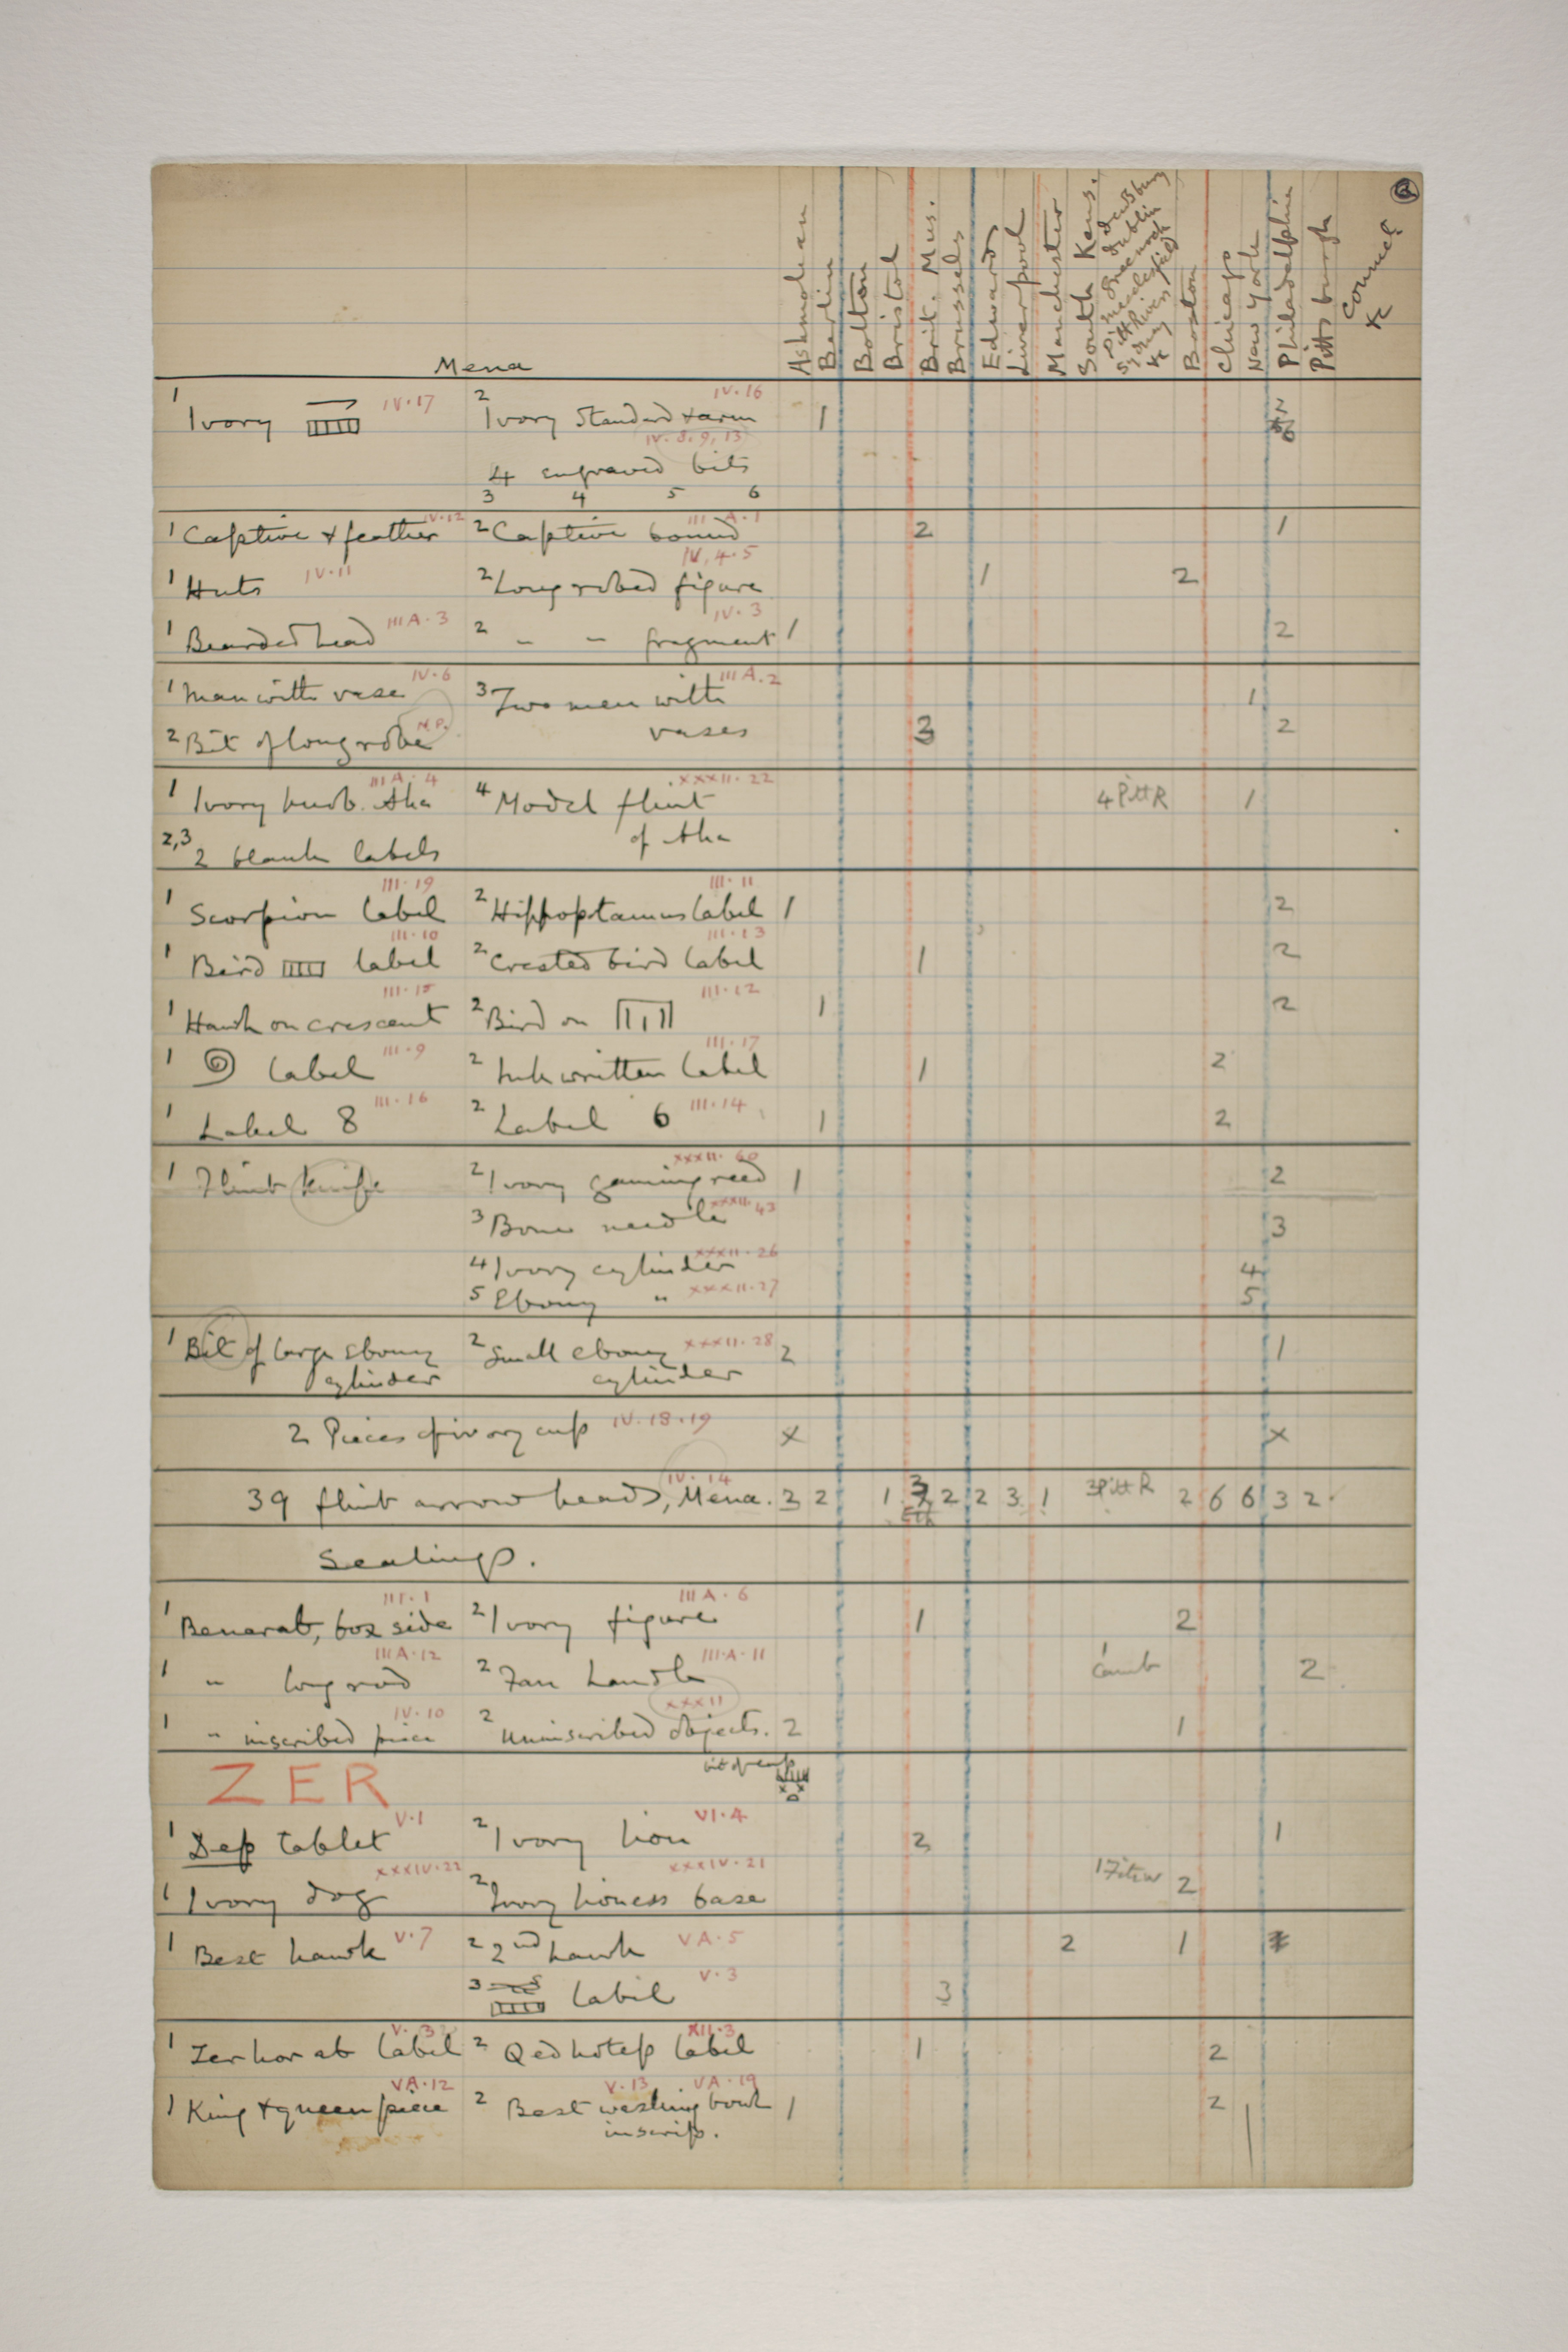 Abydos, Bet Khallaf, el-Mahasna 1900-1901, Distribution Grid, PMA/WFP1/D/9/6